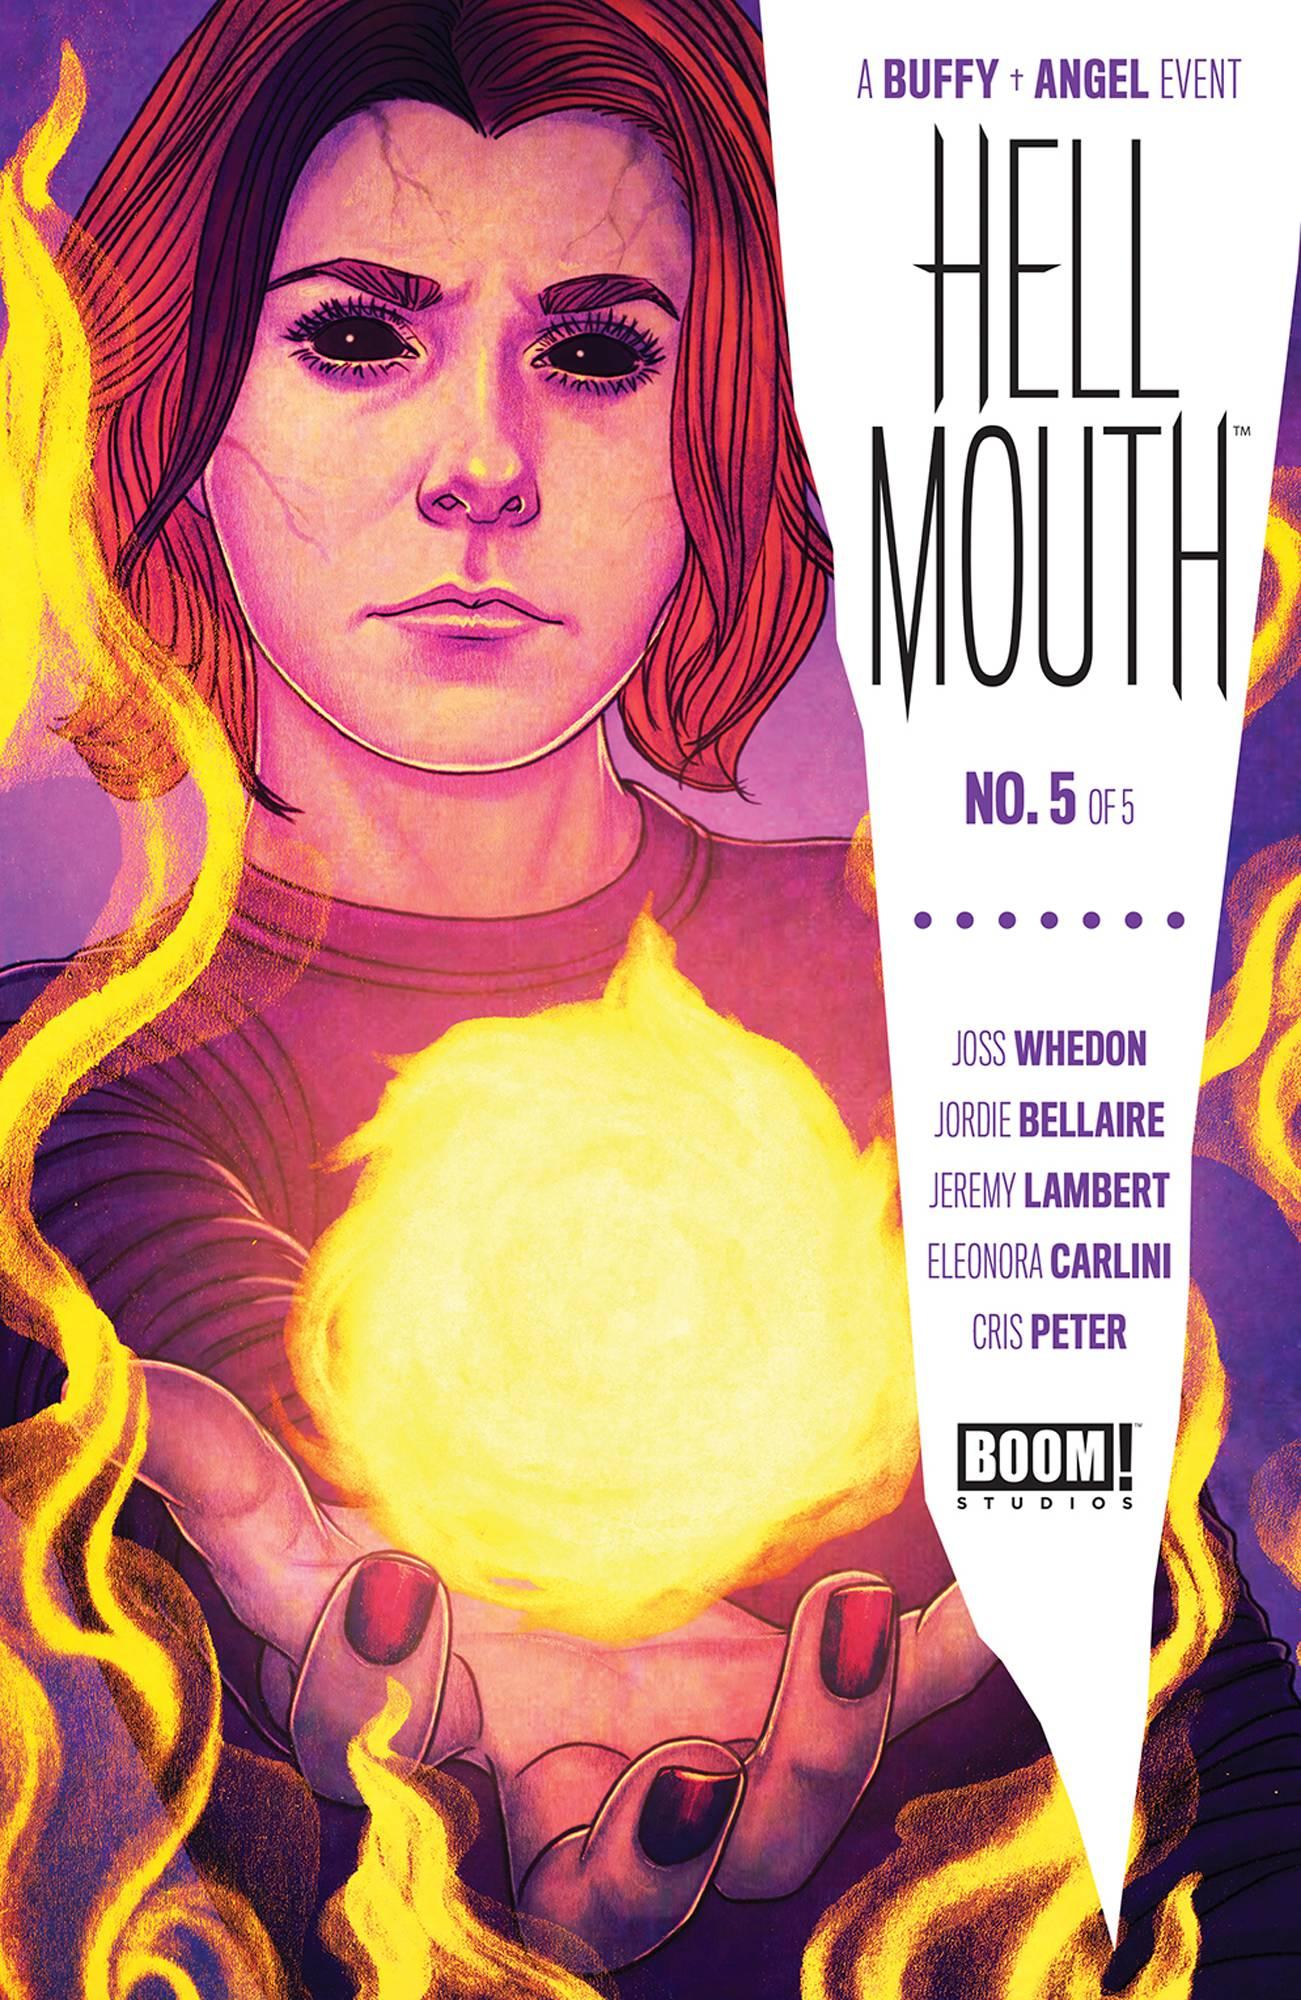 Buffy Vampire Slayer: Angel - Hellmouth #5 (2020)